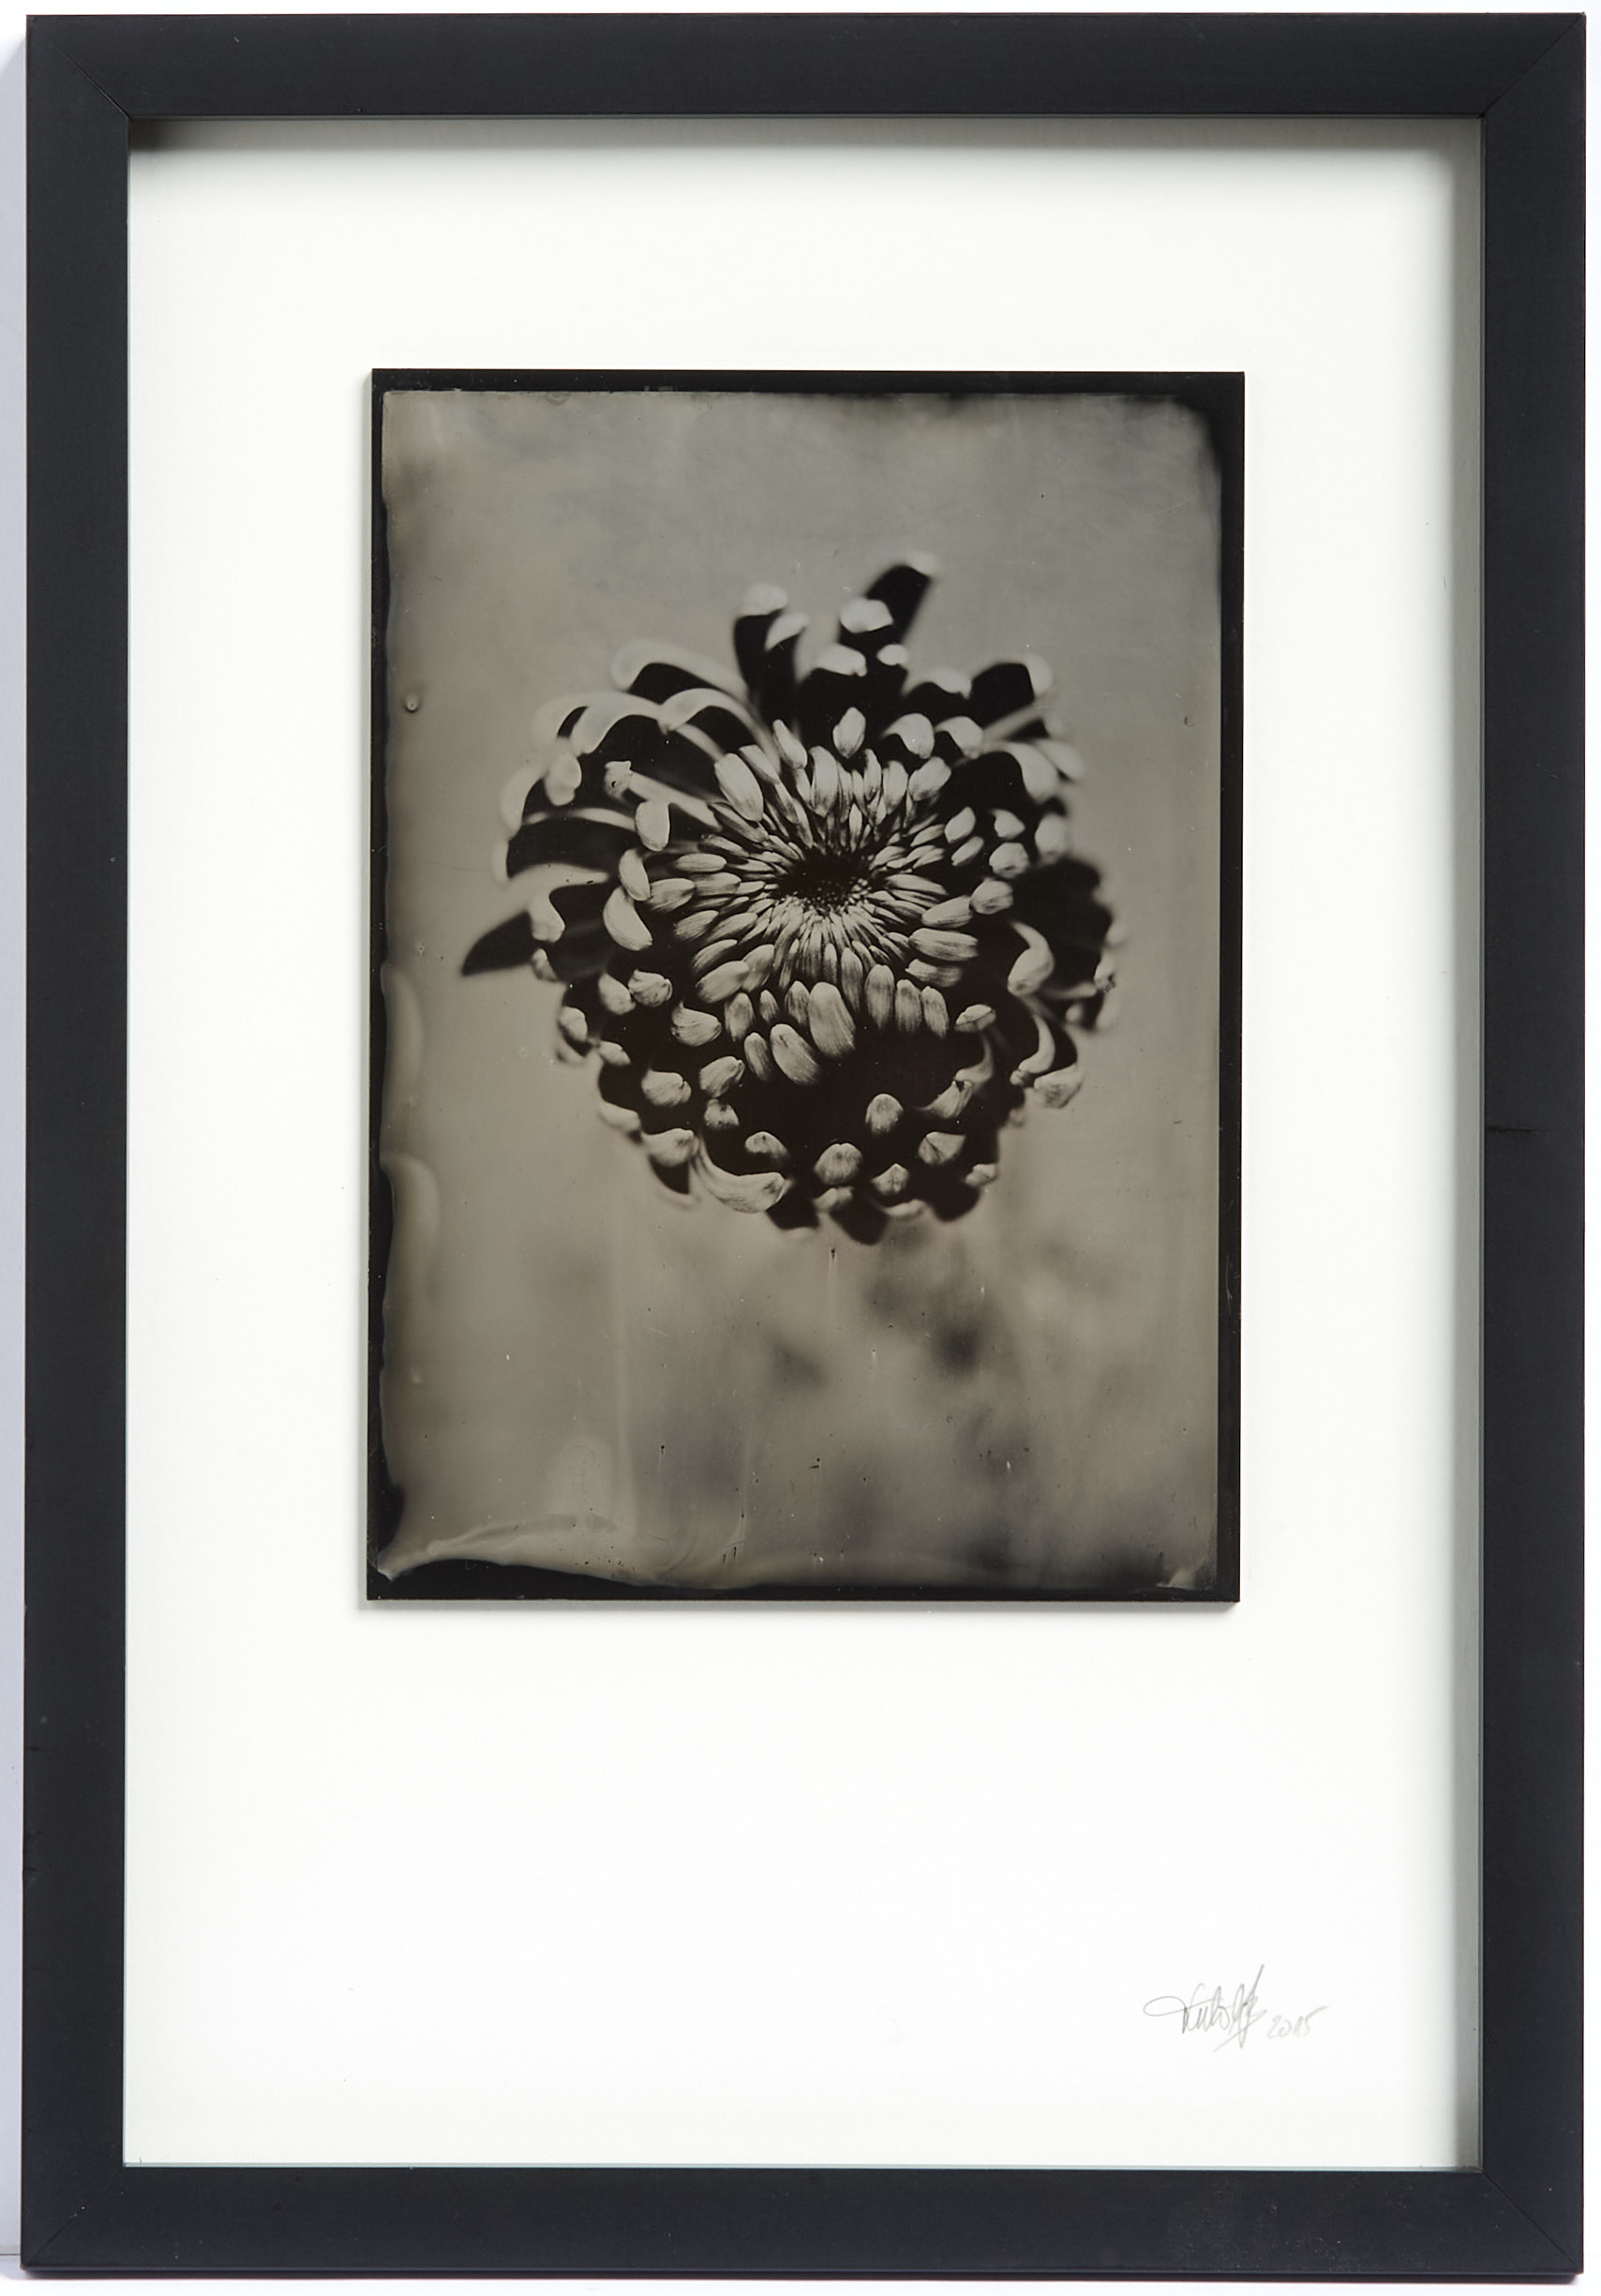 Chrysantheme Kollodium Nassplatte, Wet Plate